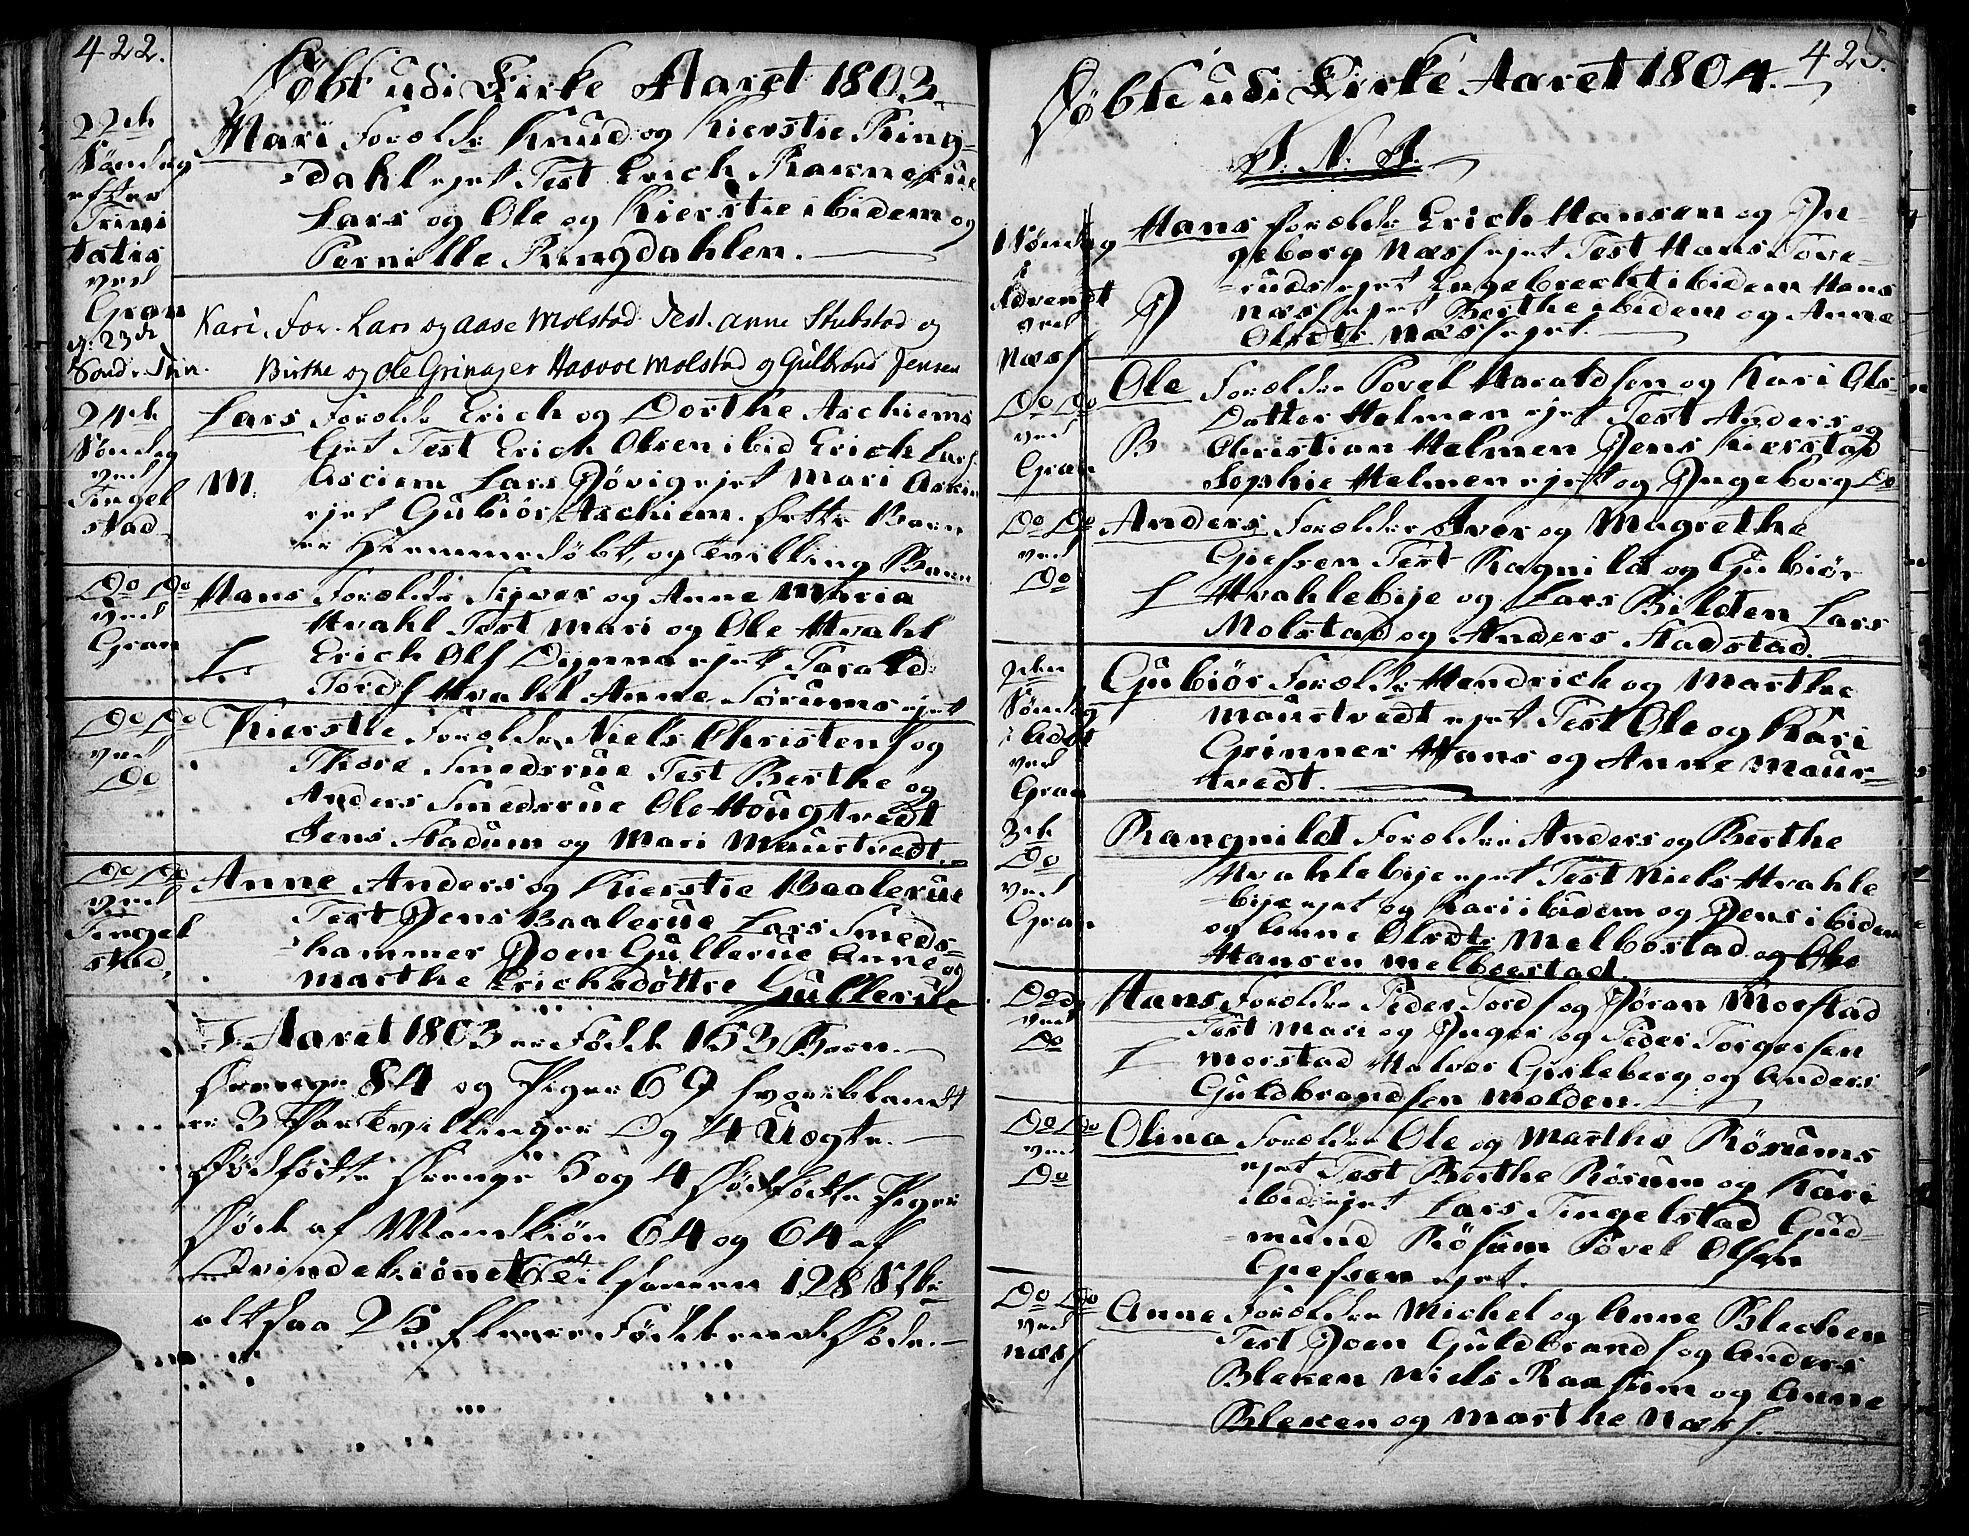 SAH, Gran prestekontor, Ministerialbok nr. 6, 1787-1824, s. 422-423